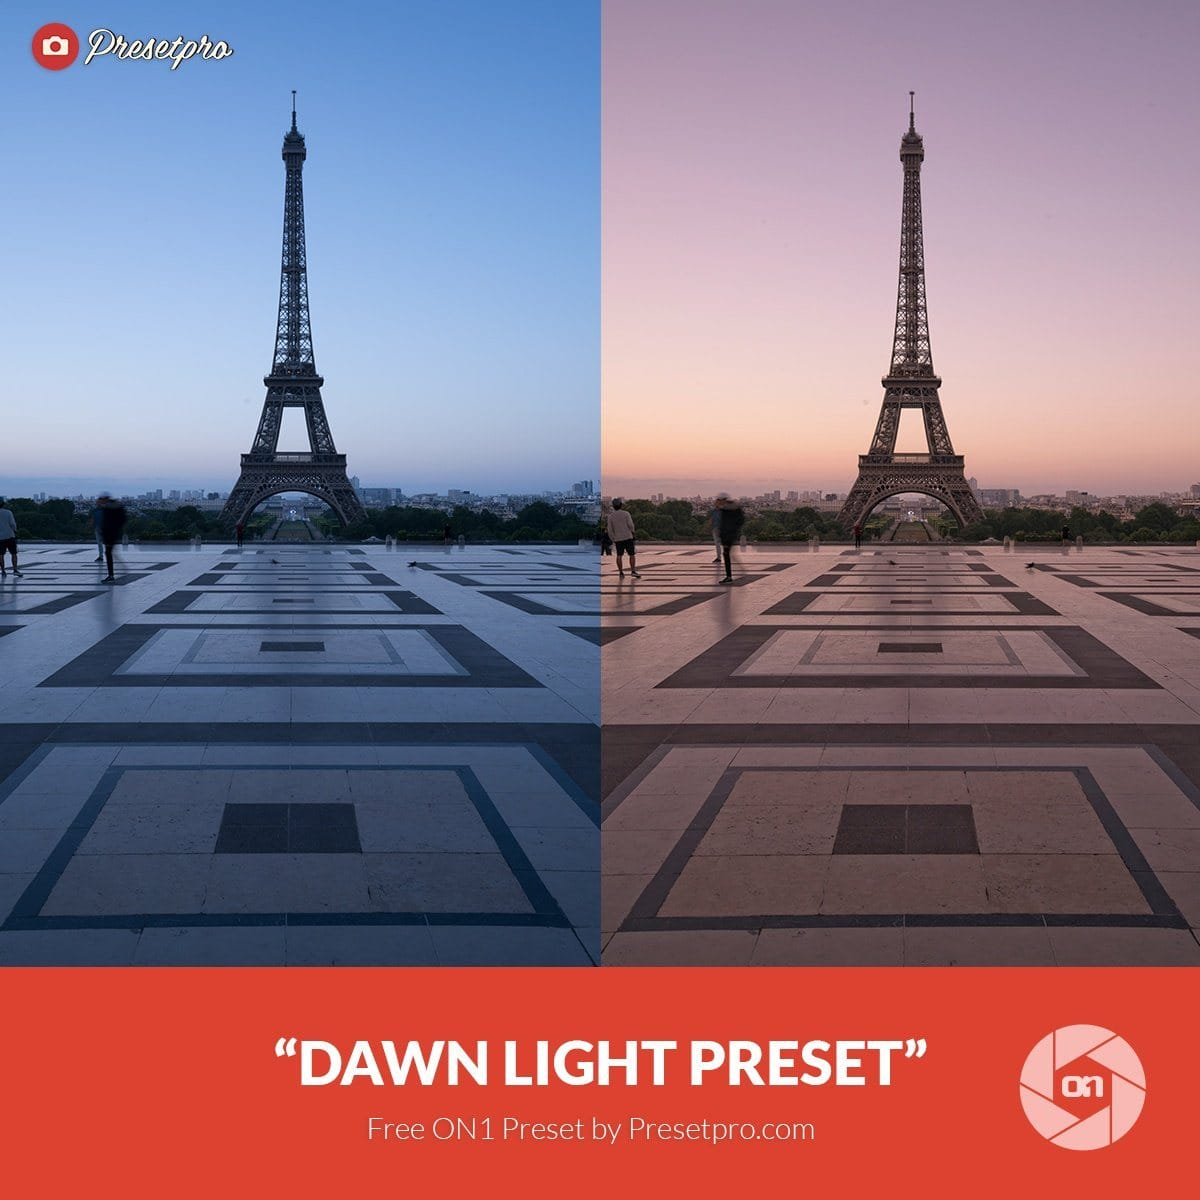 Free-On1-Preset-Dawn-Light-Presetpro.com